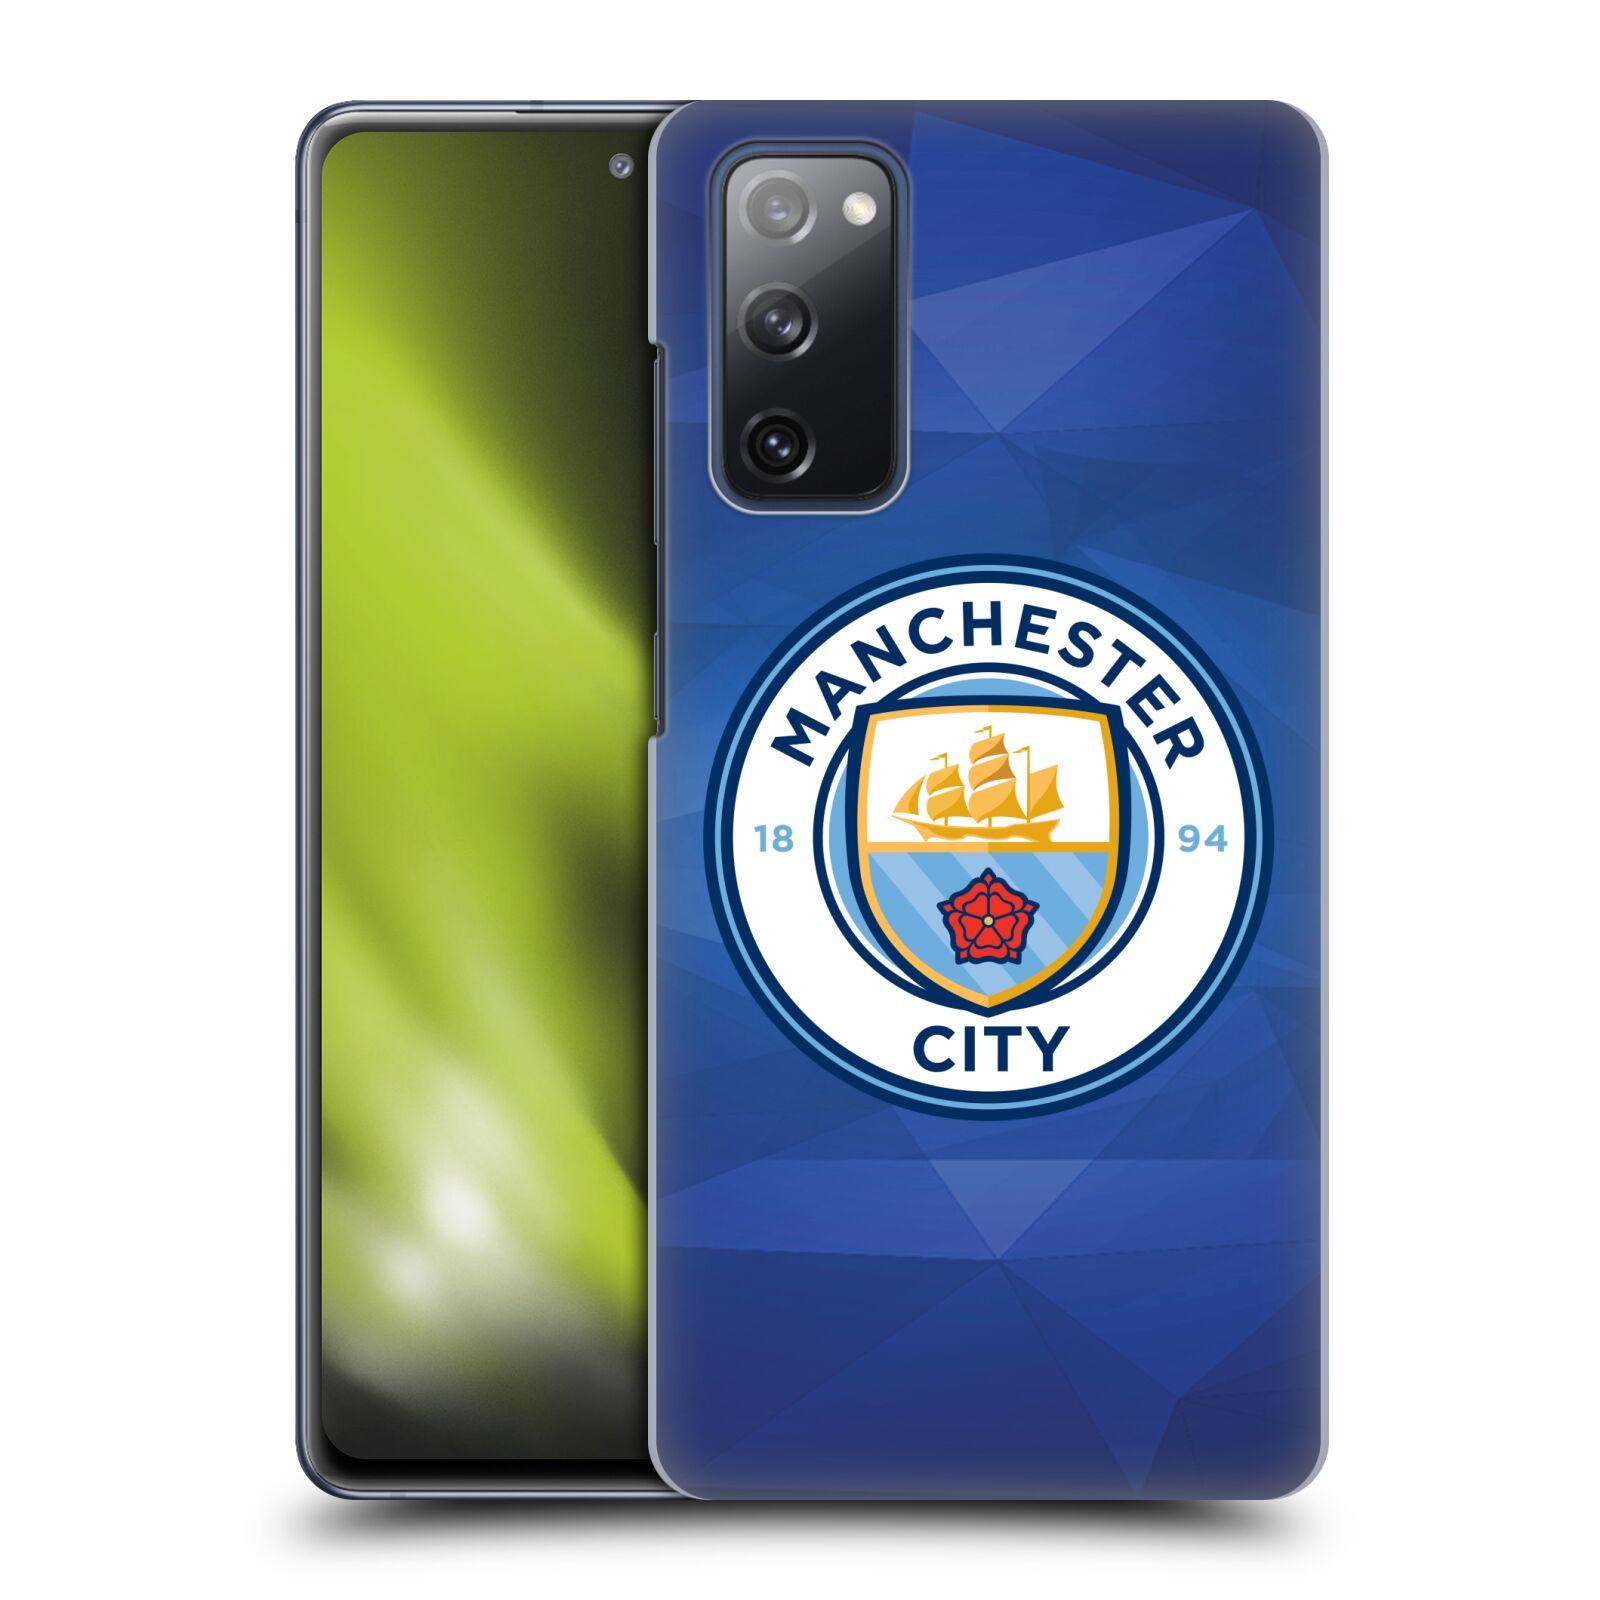 Plastové pouzdro na mobil Samsung Galaxy S20 FE - Head Case - Manchester City FC - Modré nové logo